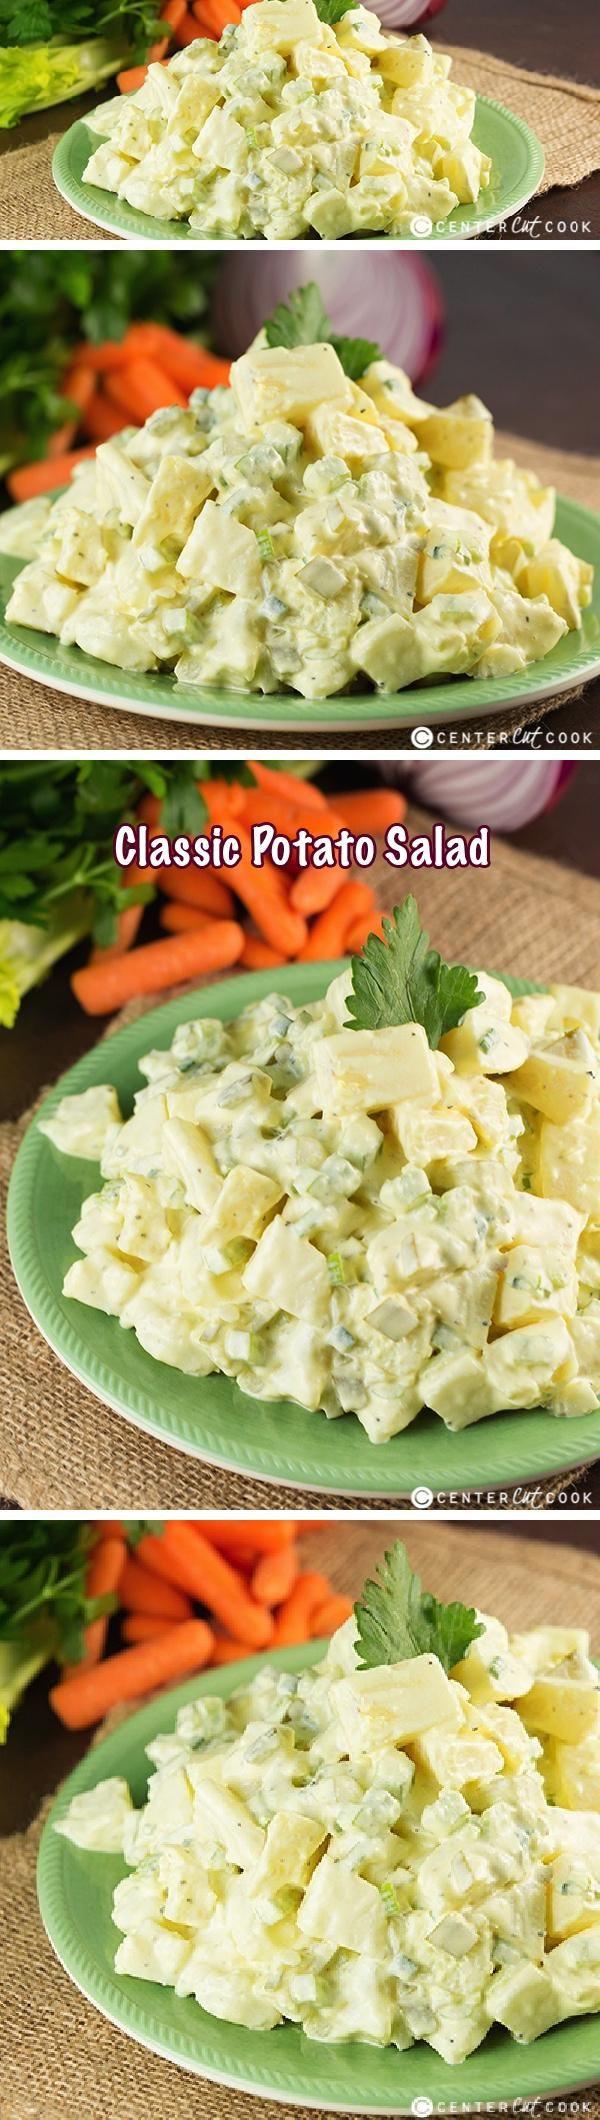 Potato Salad Without Eggs  Best 25 Potato salad ideas on Pinterest